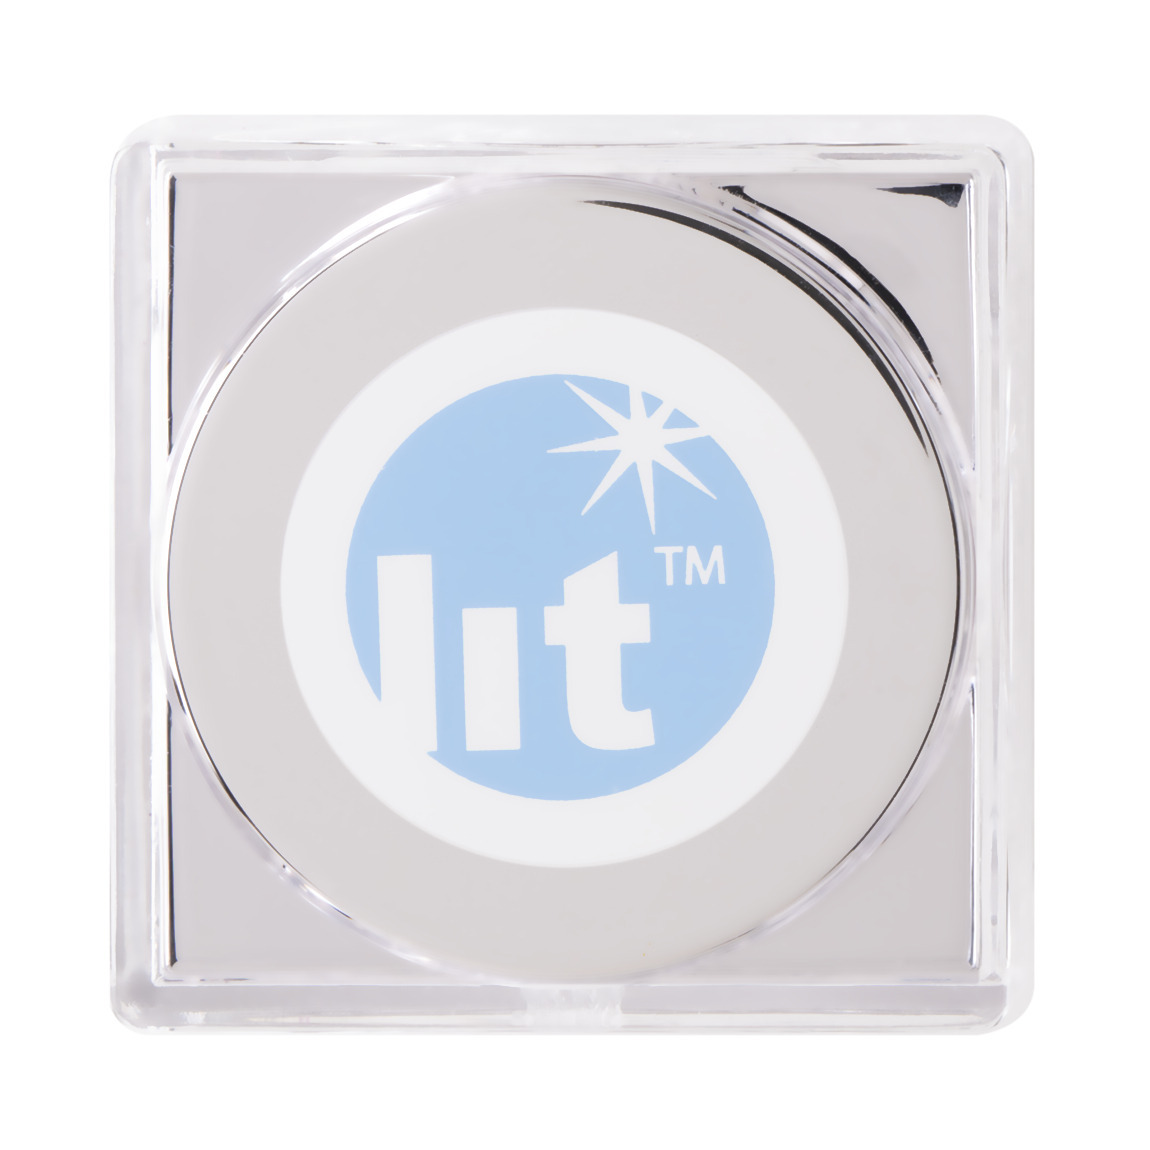 Lit Cosmetics Lit Glitter Sugar & Spice S2 (Solid) alternative view 1.